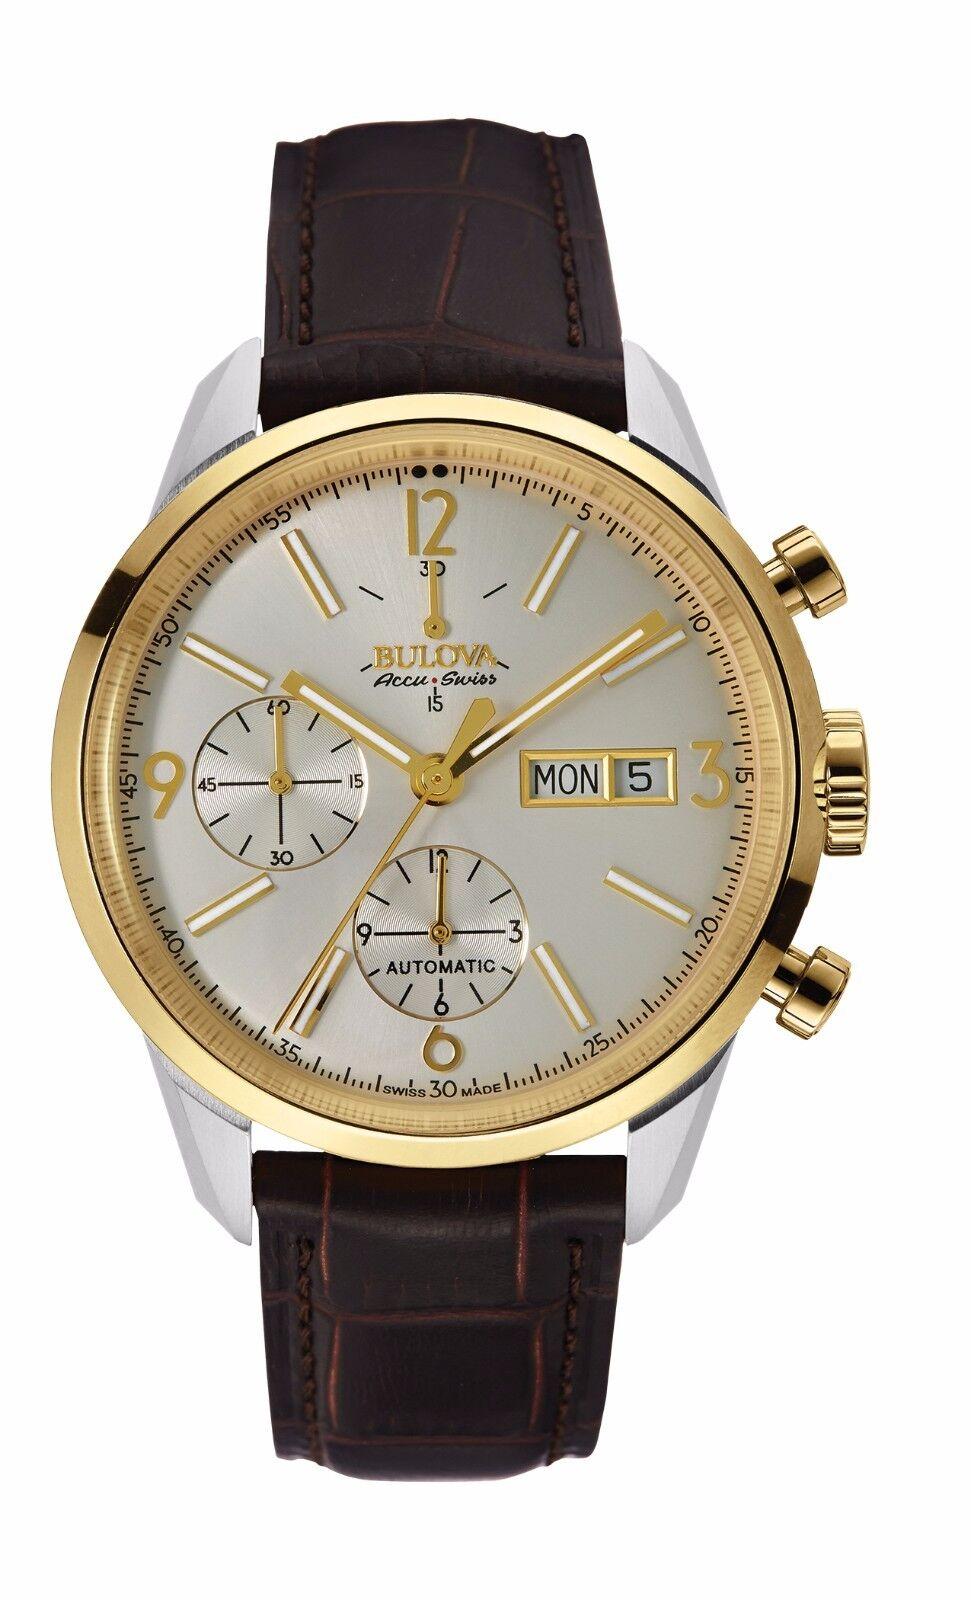 Bulova Watches Official US Site | Bulova